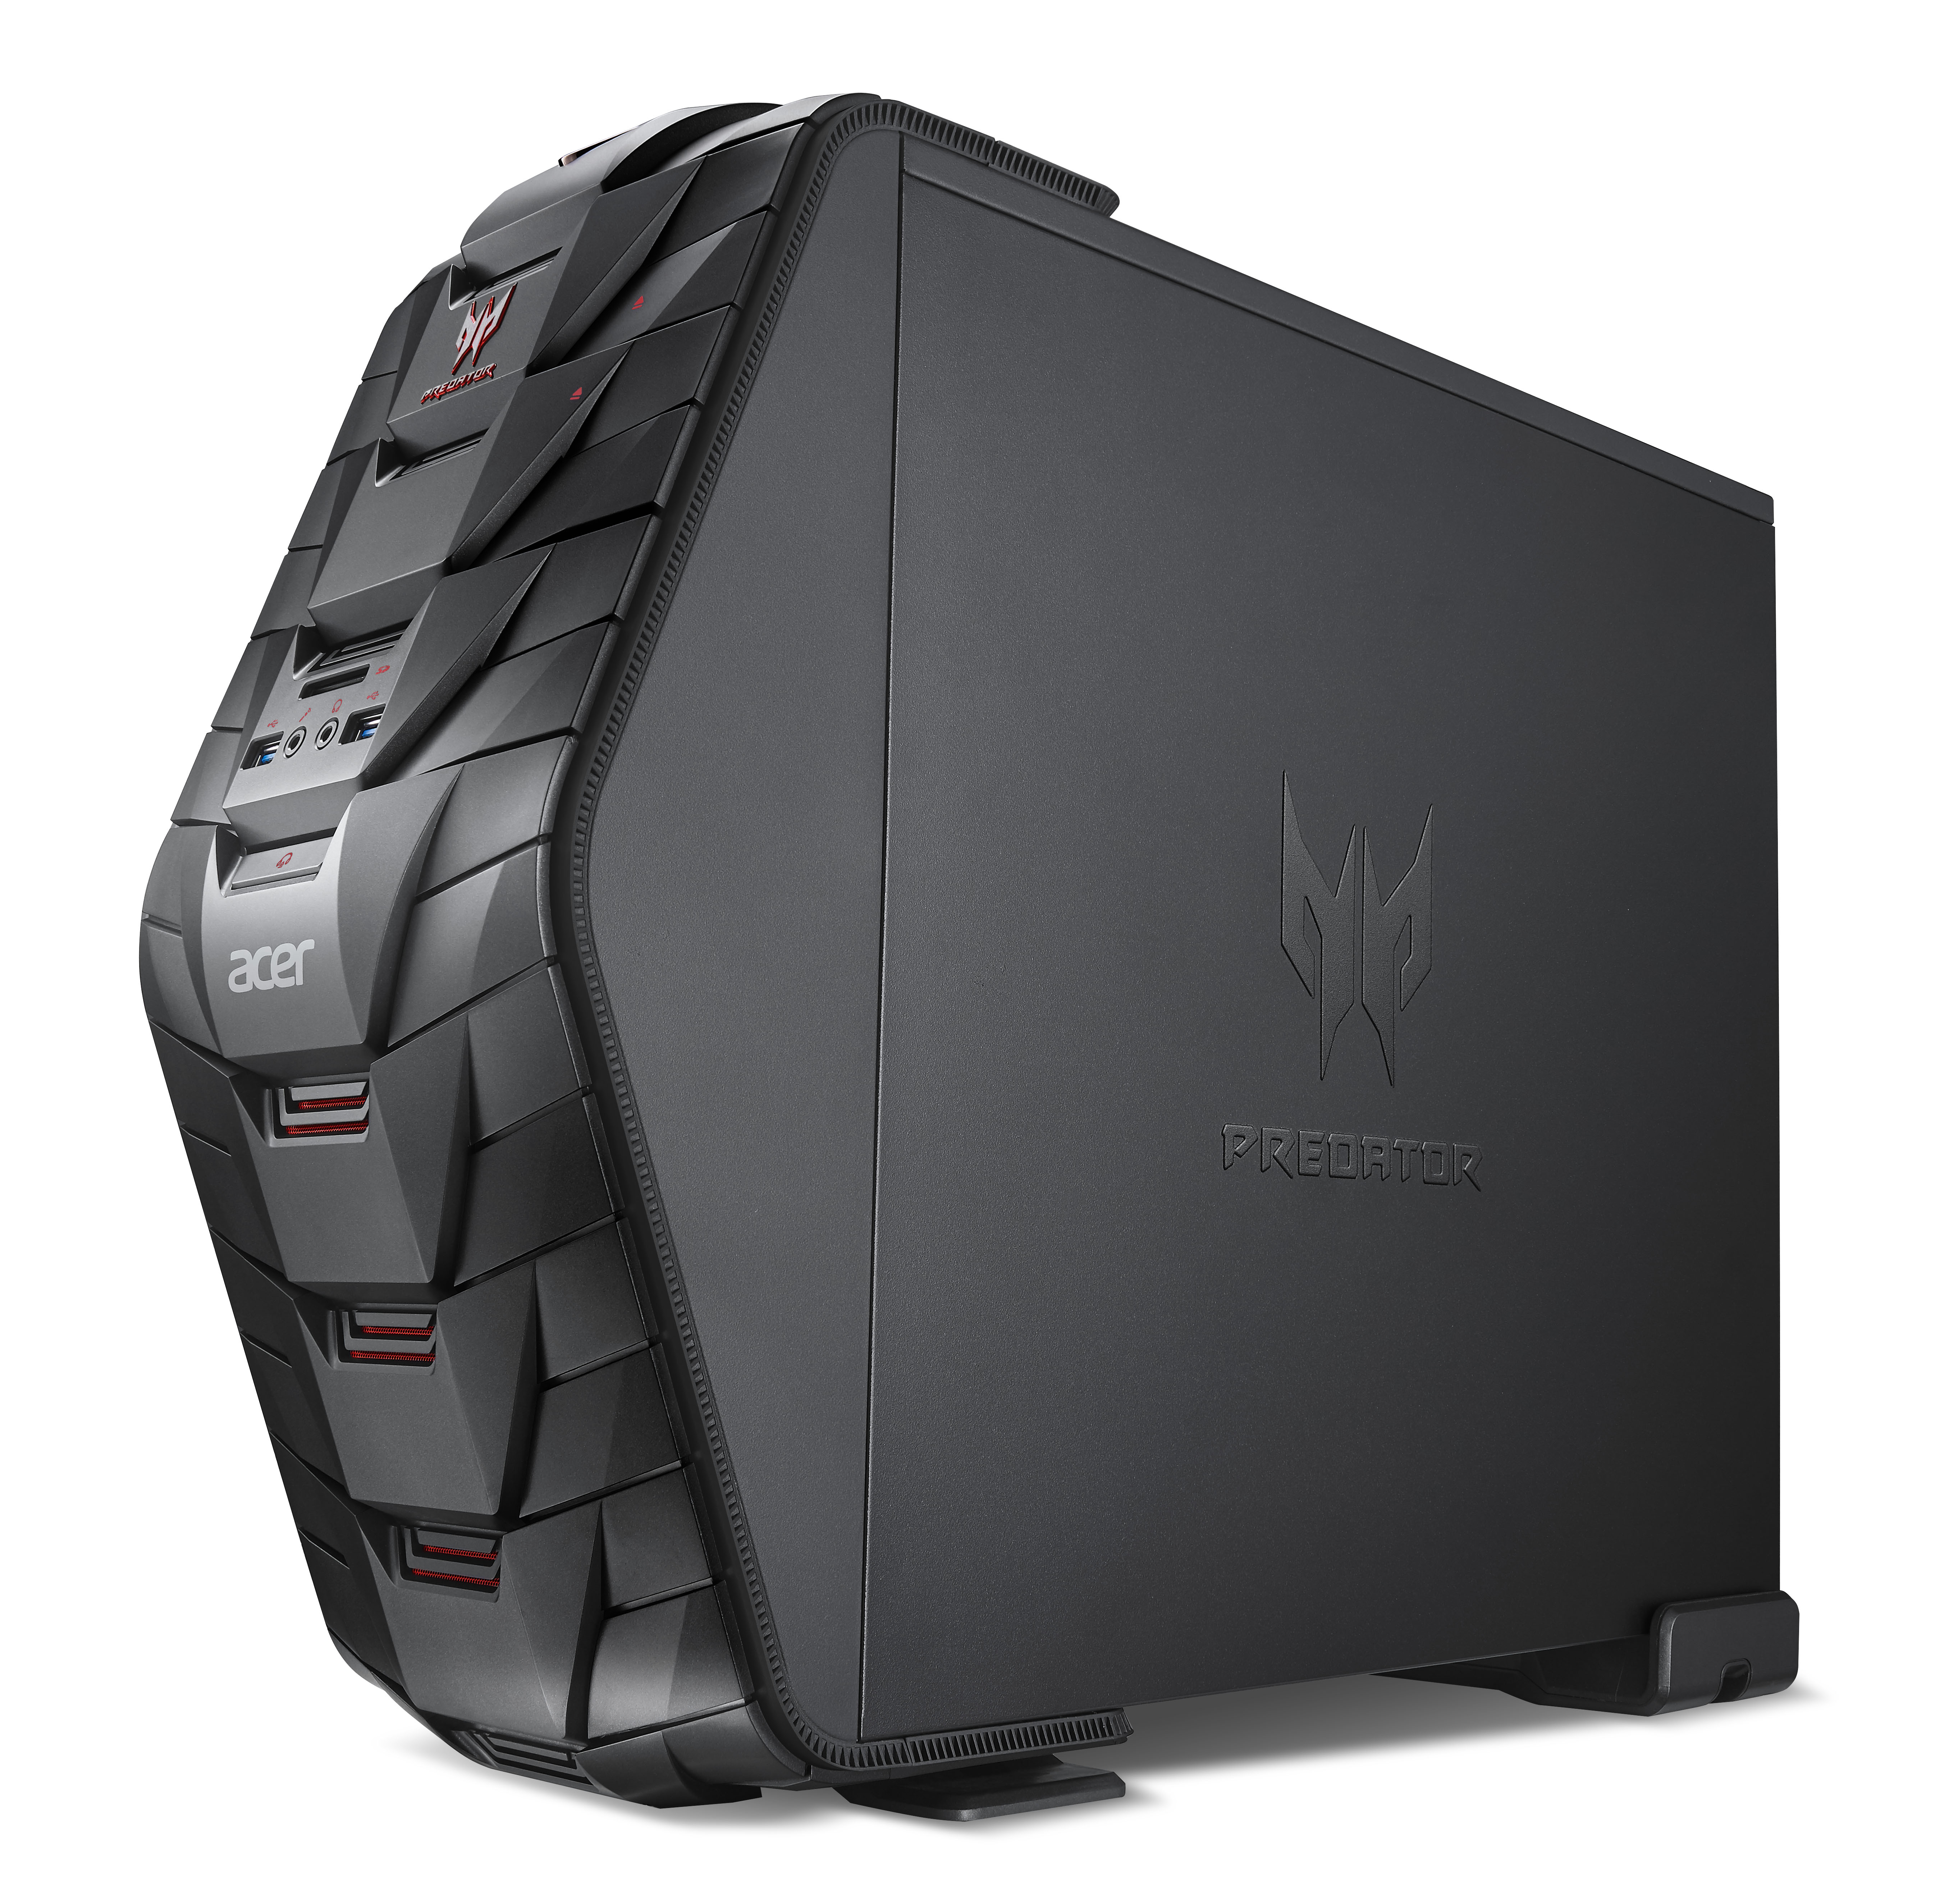 9a84c584e7c Product data-sheet Acer Predator G3-710 6th gen Intel® Core™ i7 i7 ...